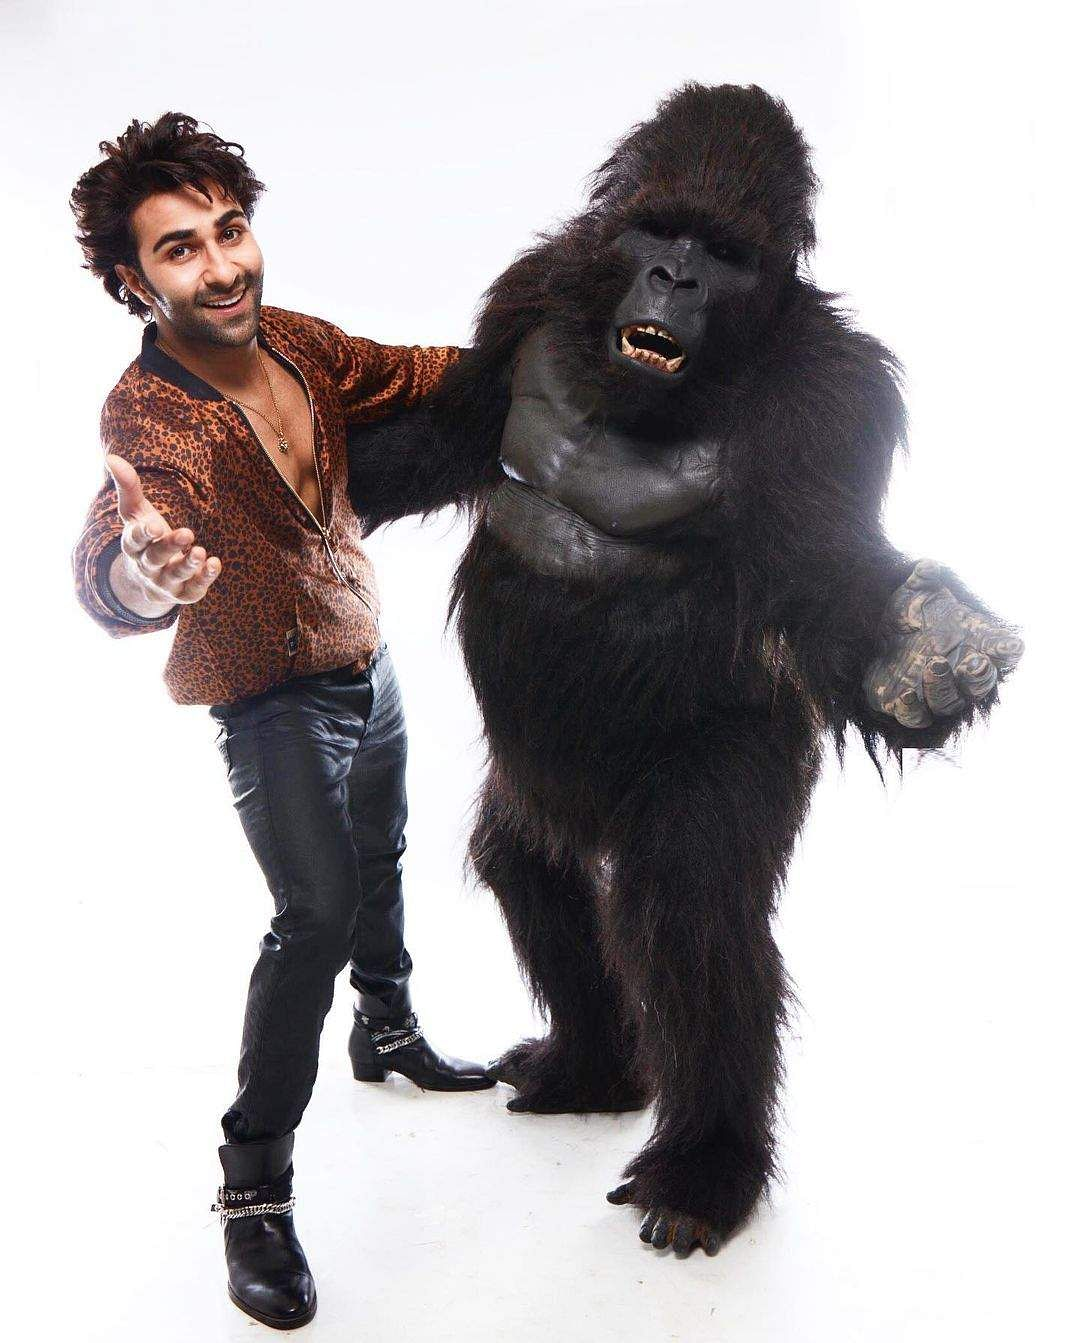 Aadar Jain stars in a new comedy, co-starring a gorilla